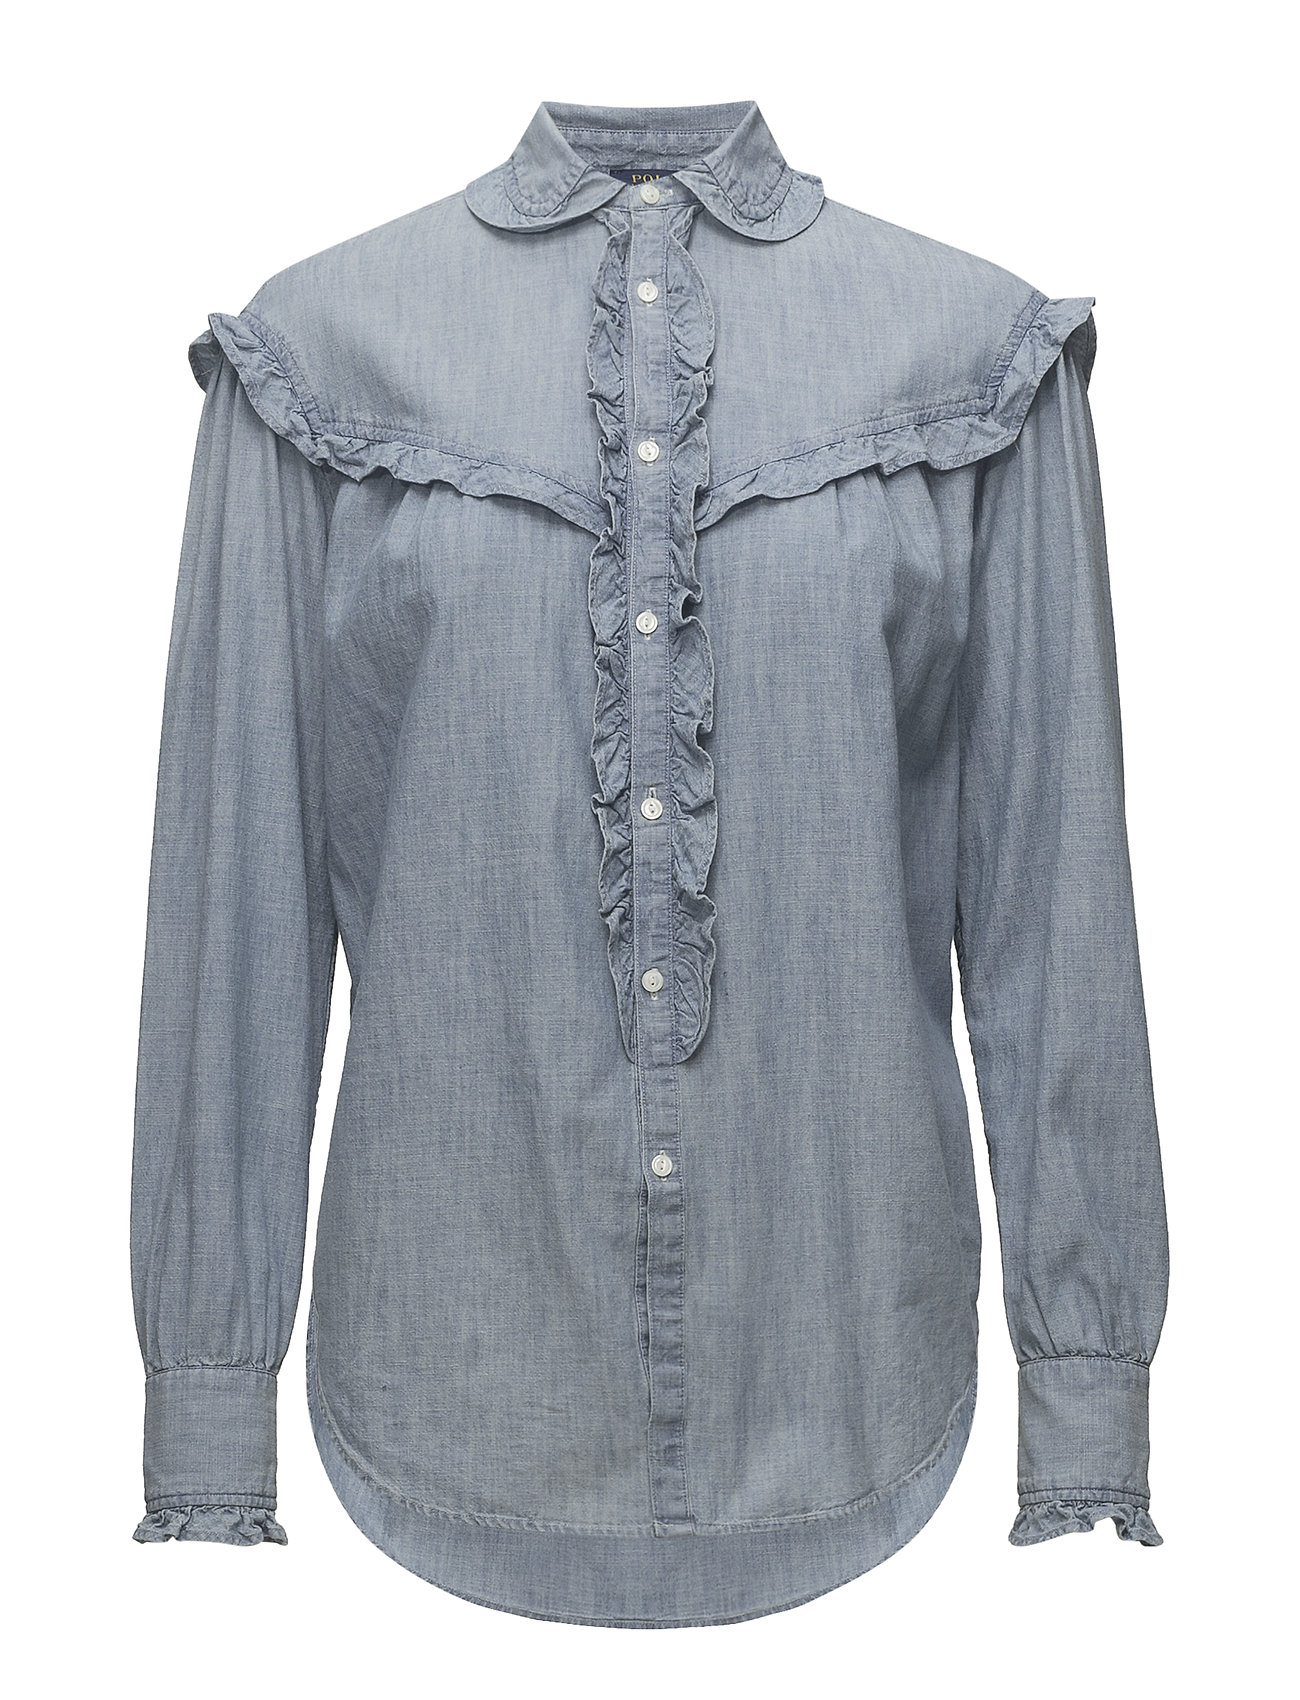 Polo Ralph Lauren Ruffle Trim Denim Shirt